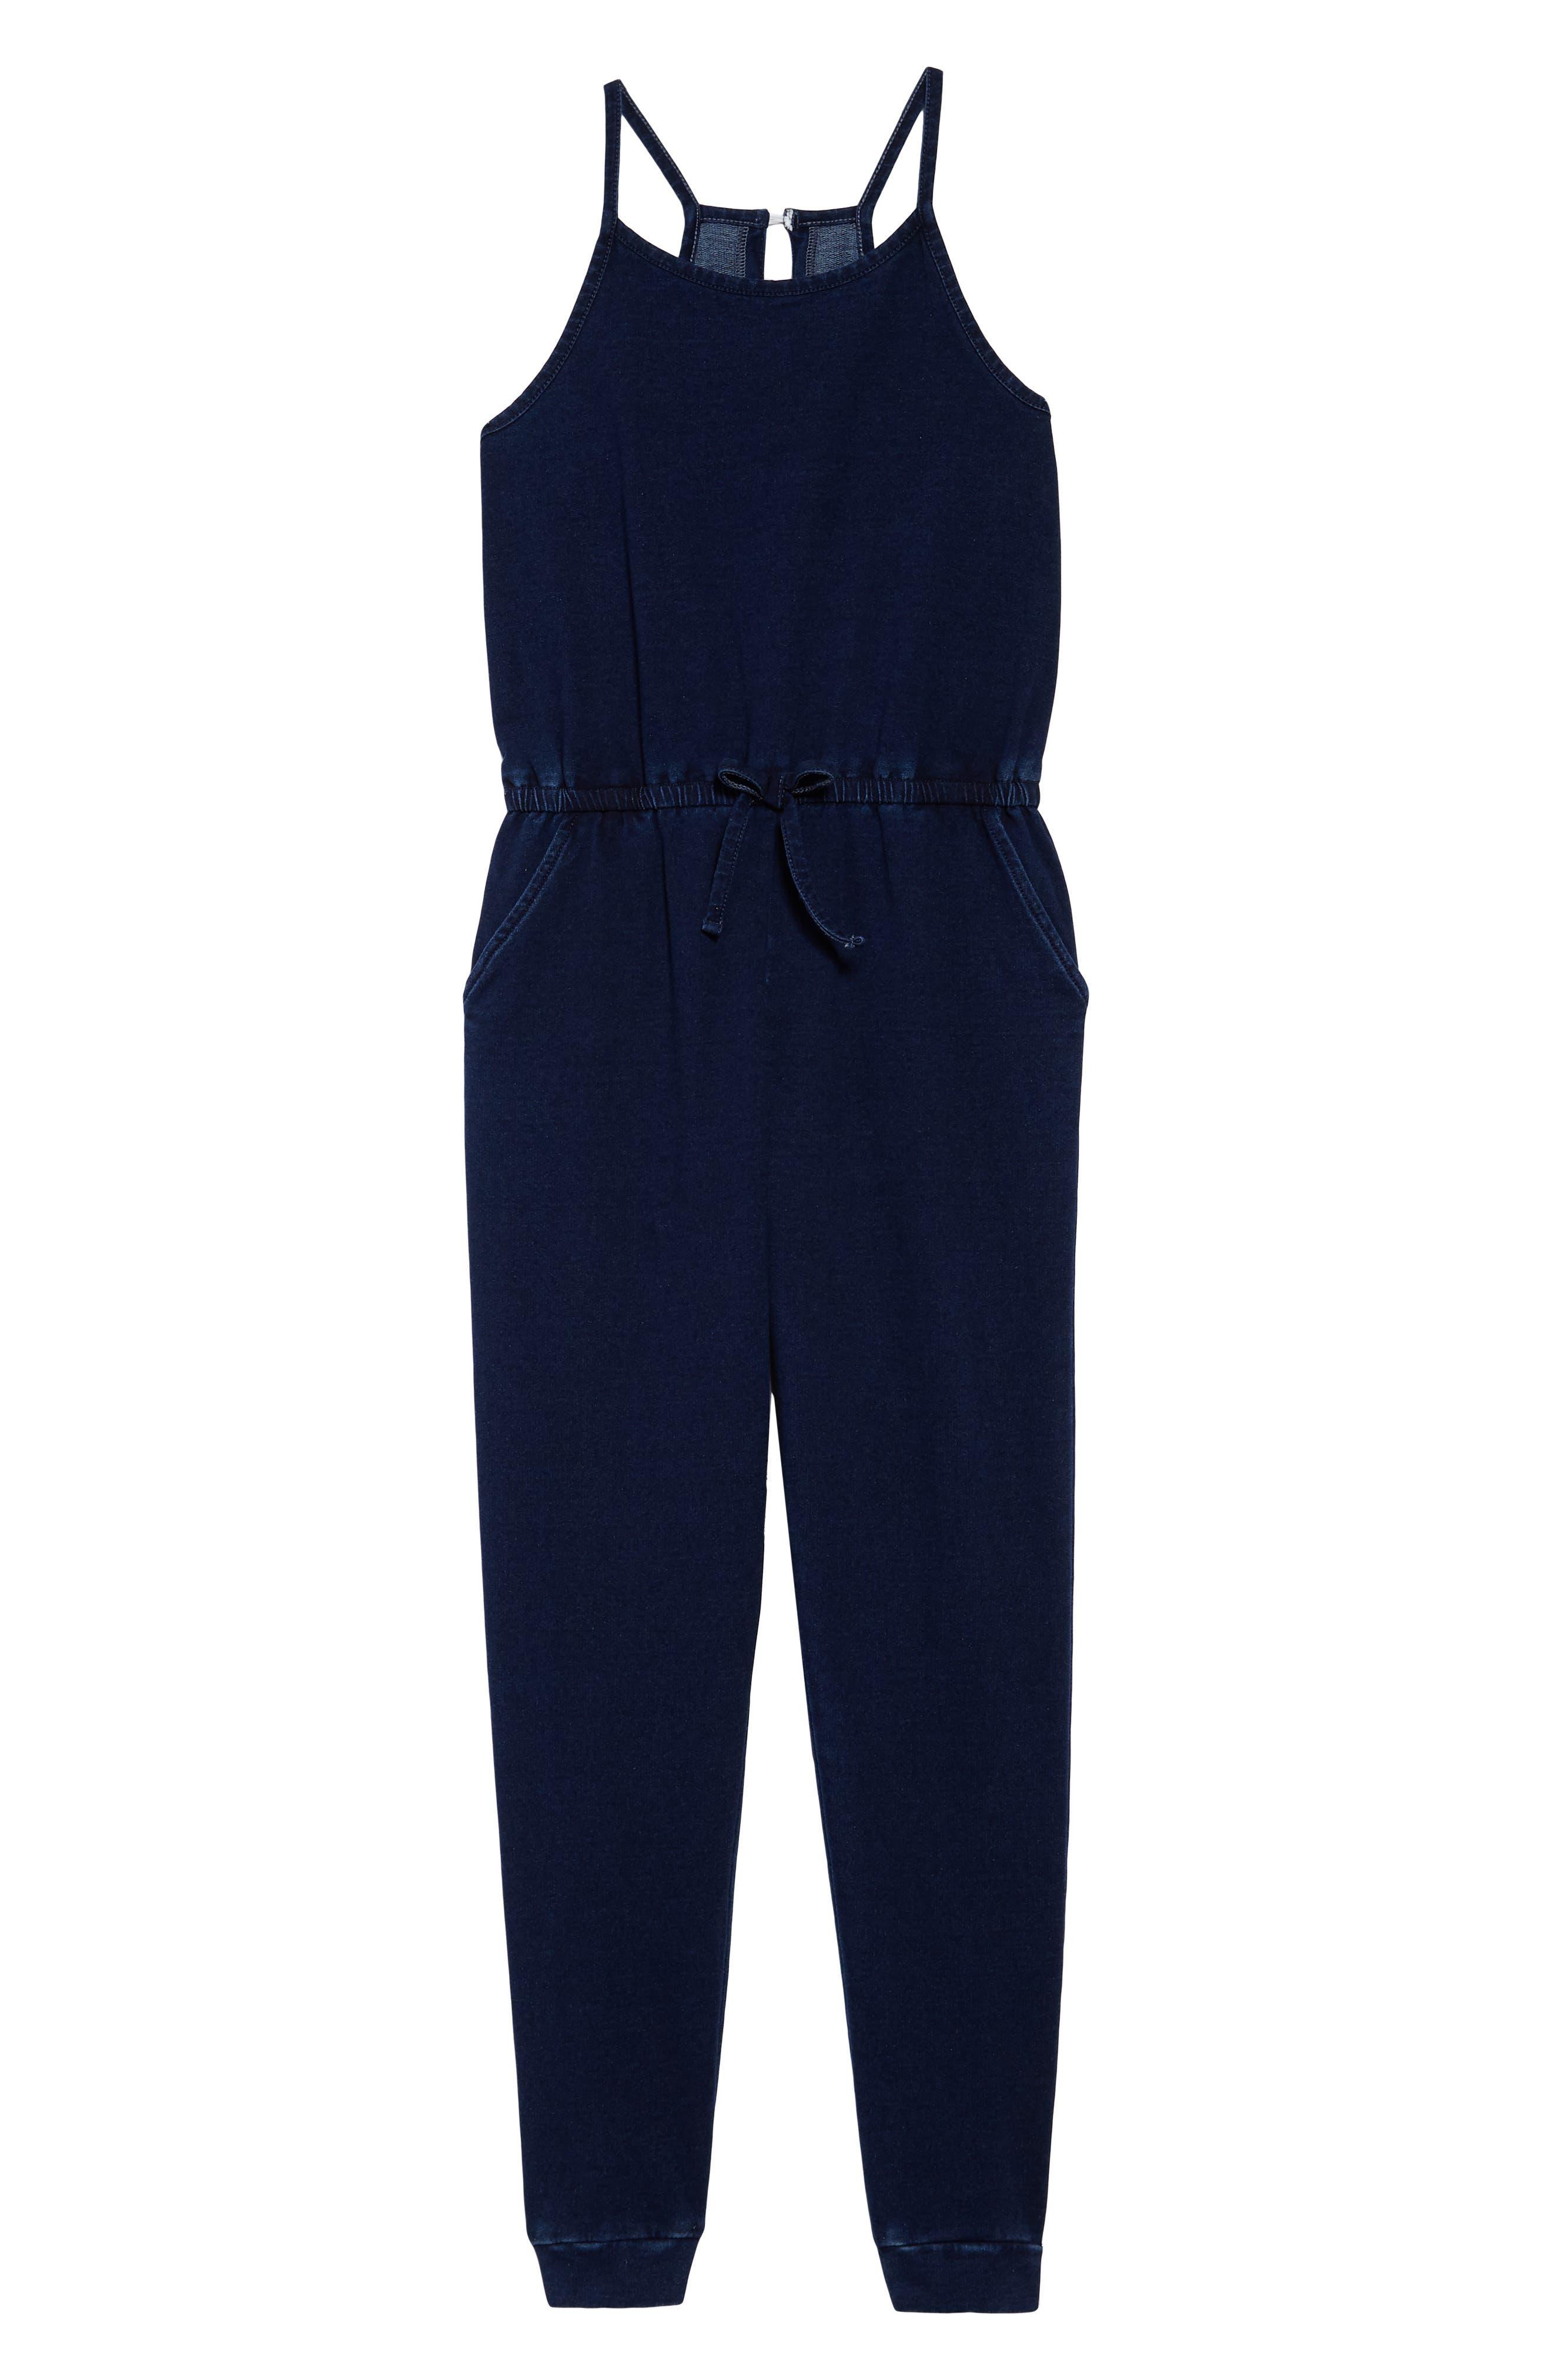 Girls Habitual Girl Lorrie Jumpsuit Size 12  Blue